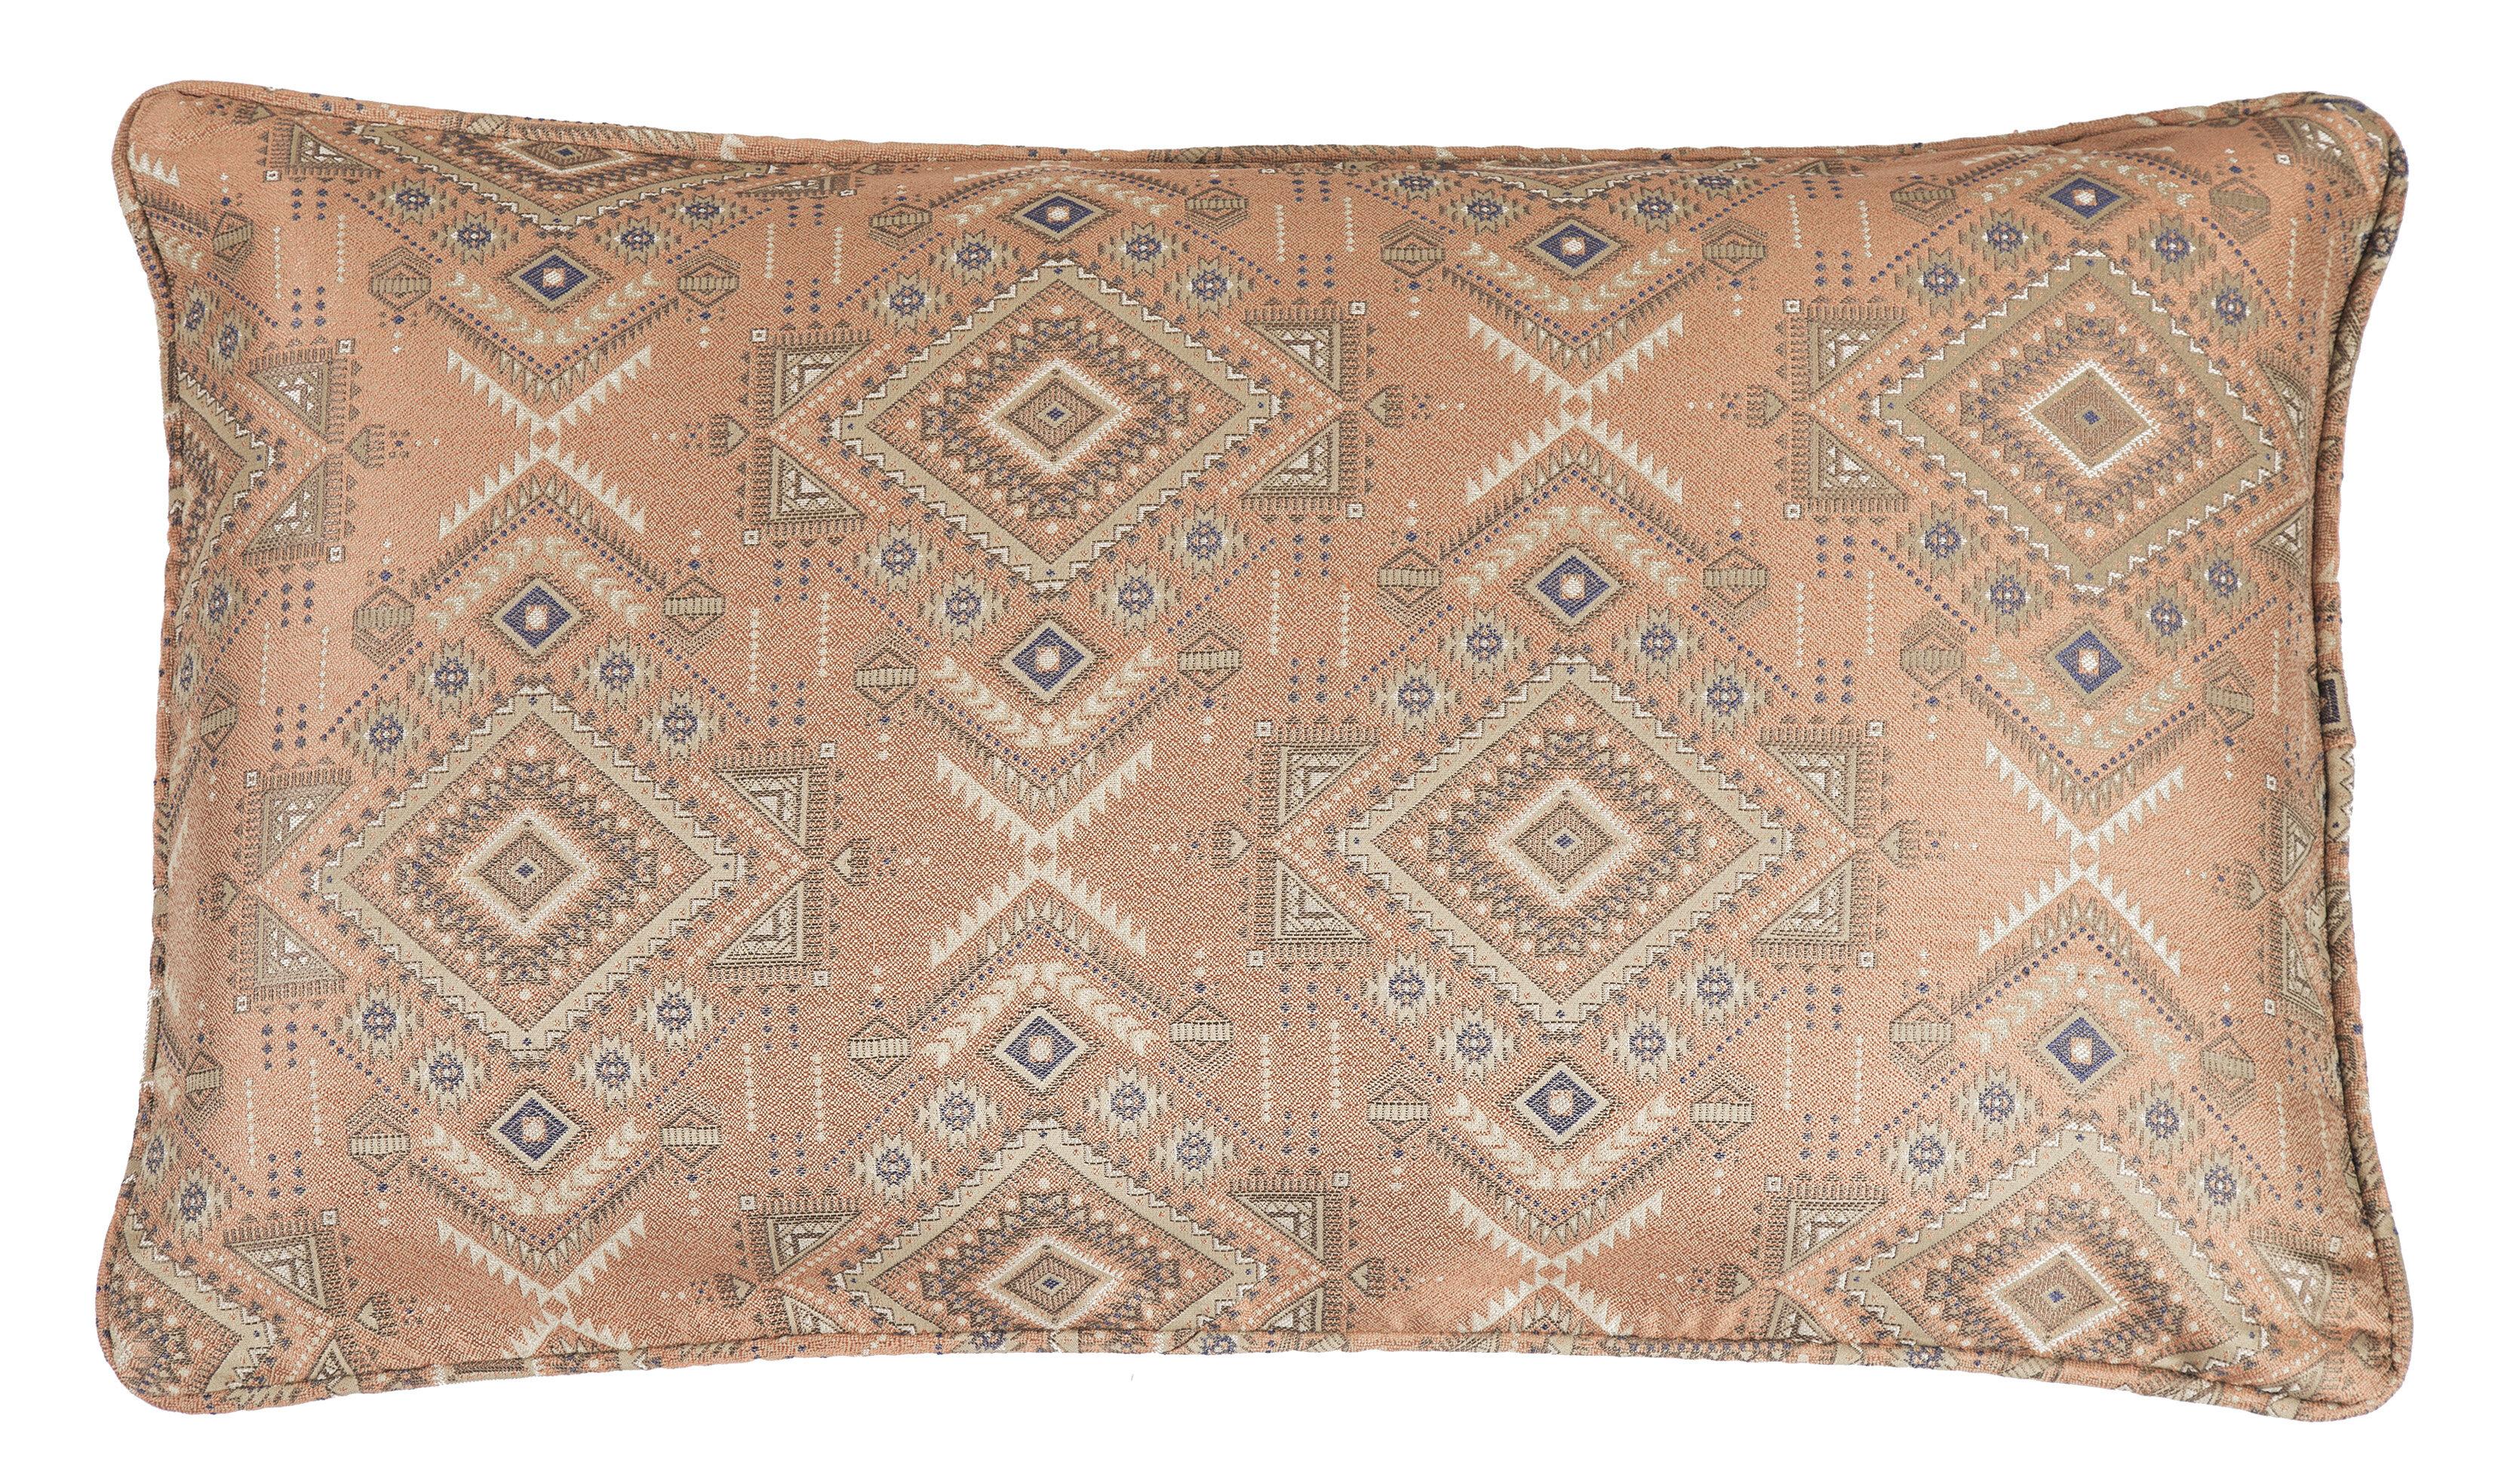 Geometric Loon Peak Throw Pillows You Ll Love In 2021 Wayfair